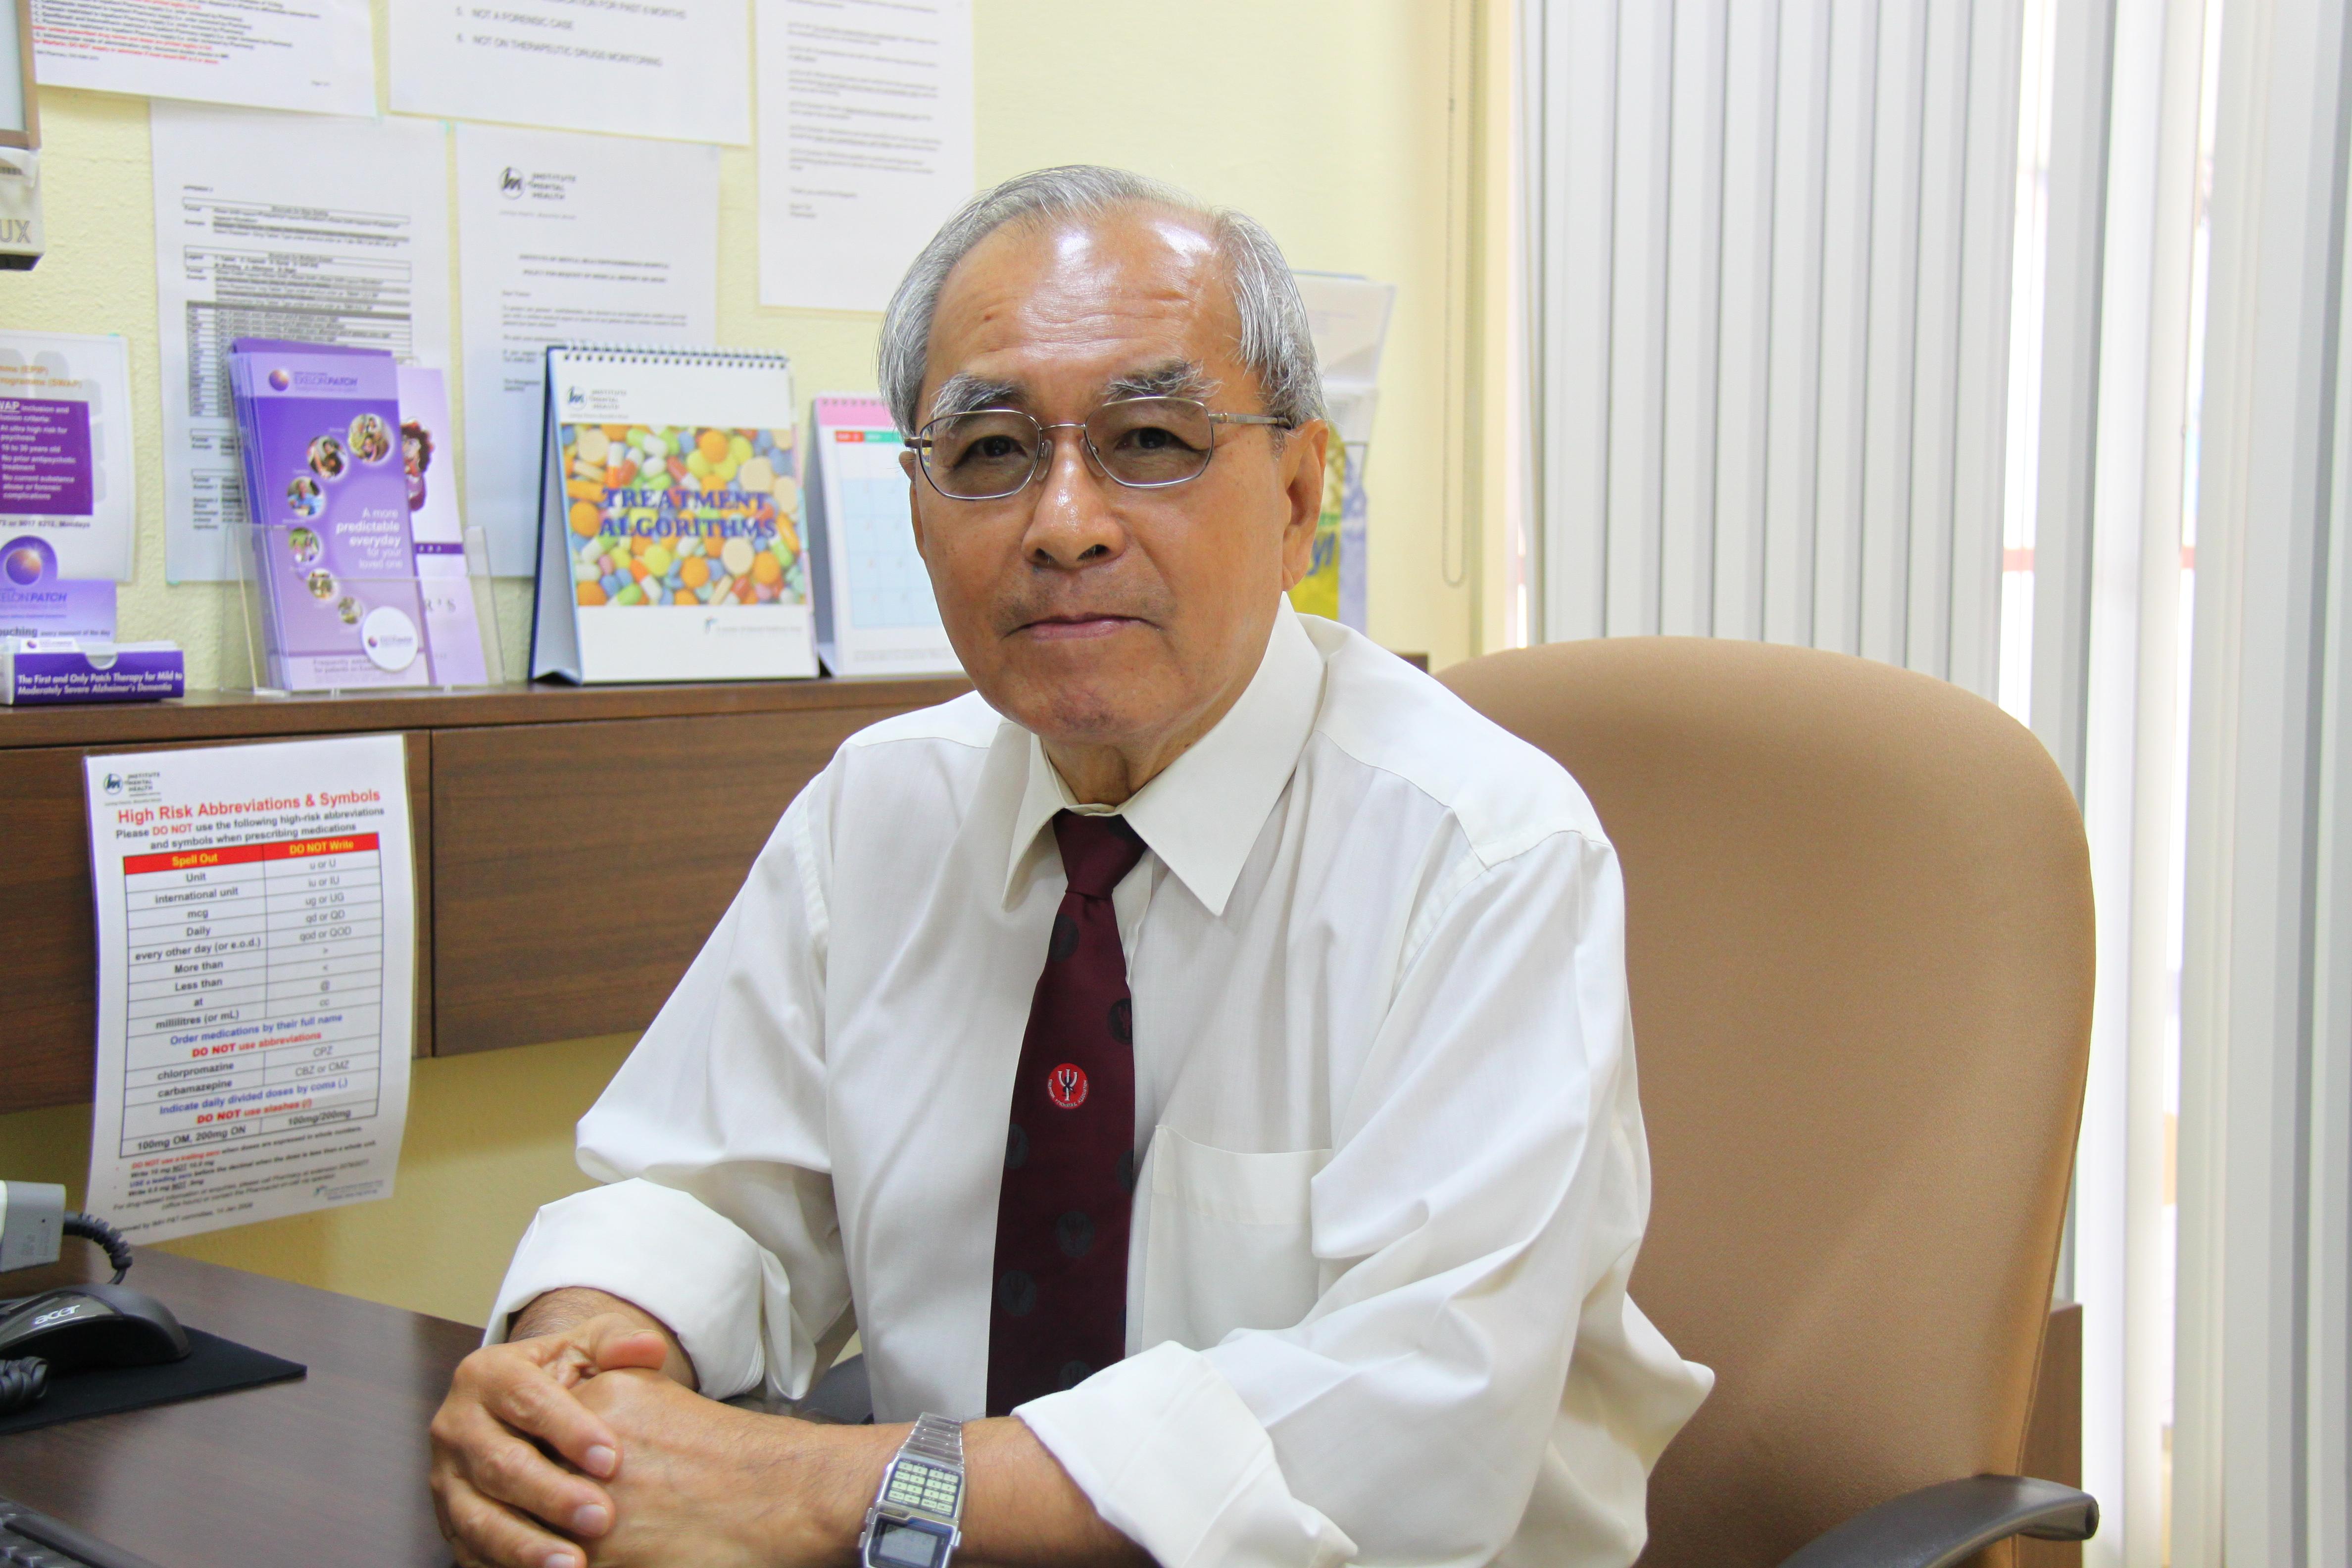 AProf Chee Kuan Tsee